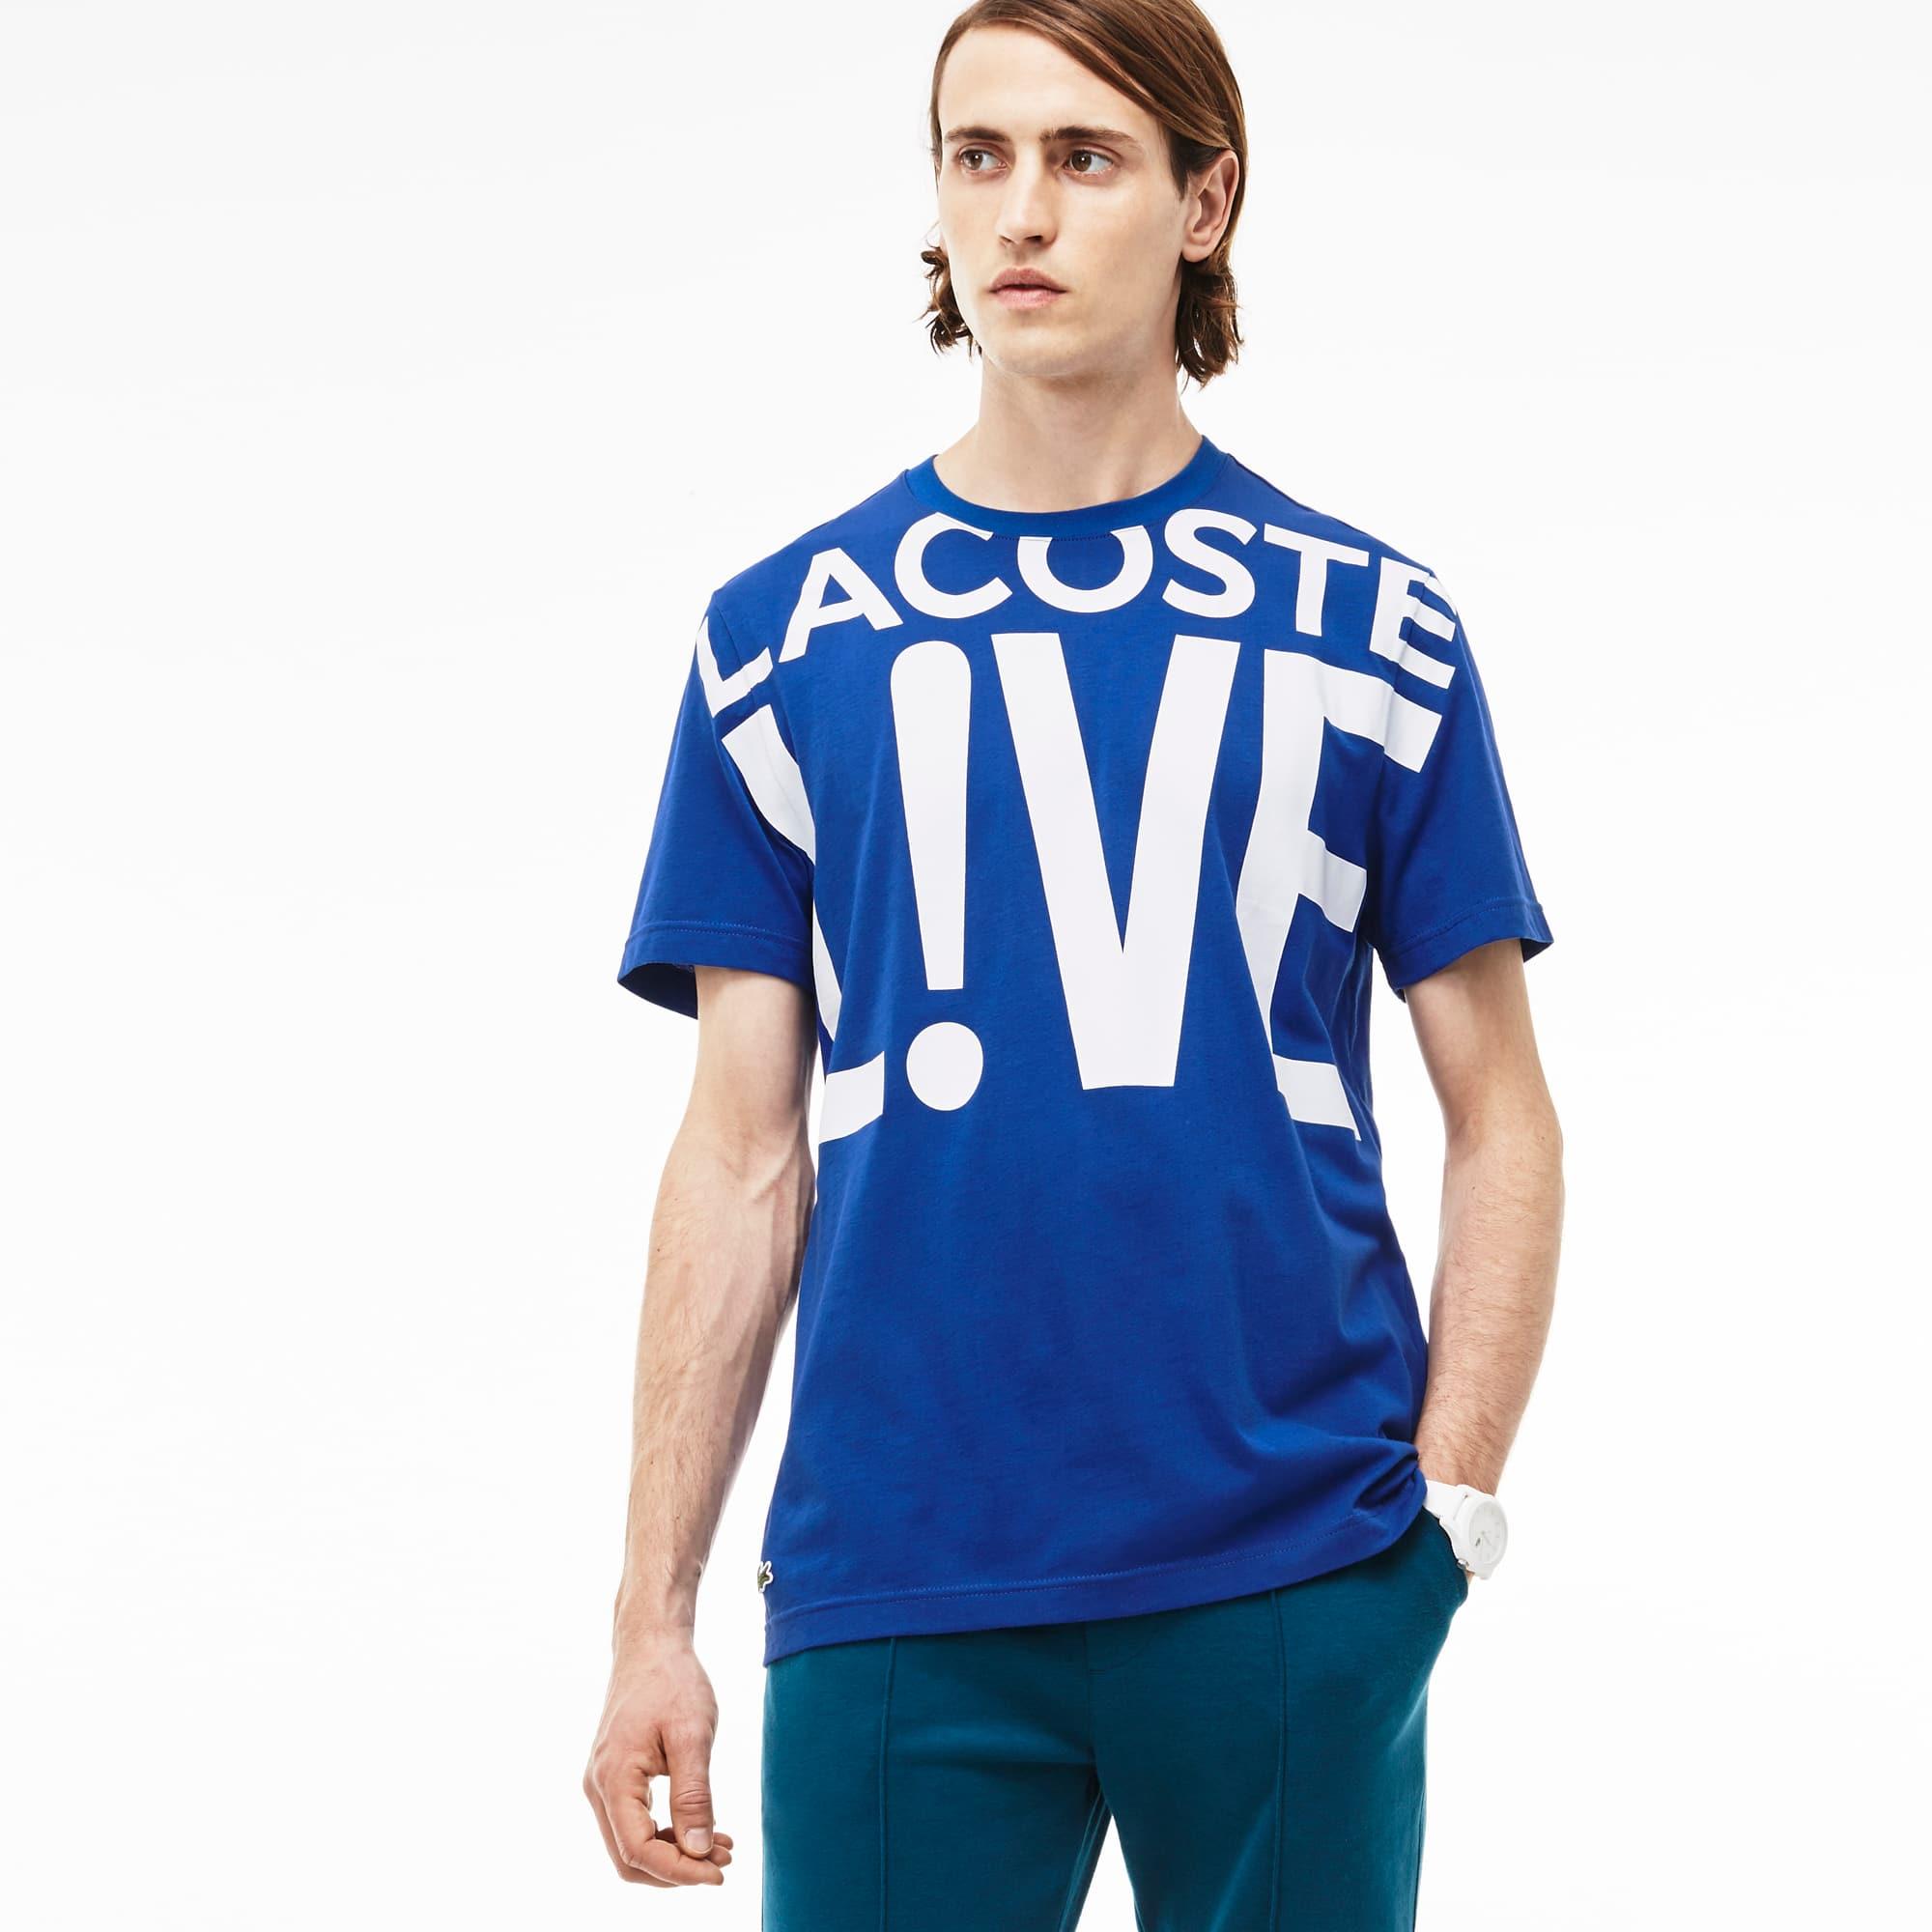 Camiseta Lacoste LIVE de corte ultra-slim con cuello barco con estampado Lacoste Live